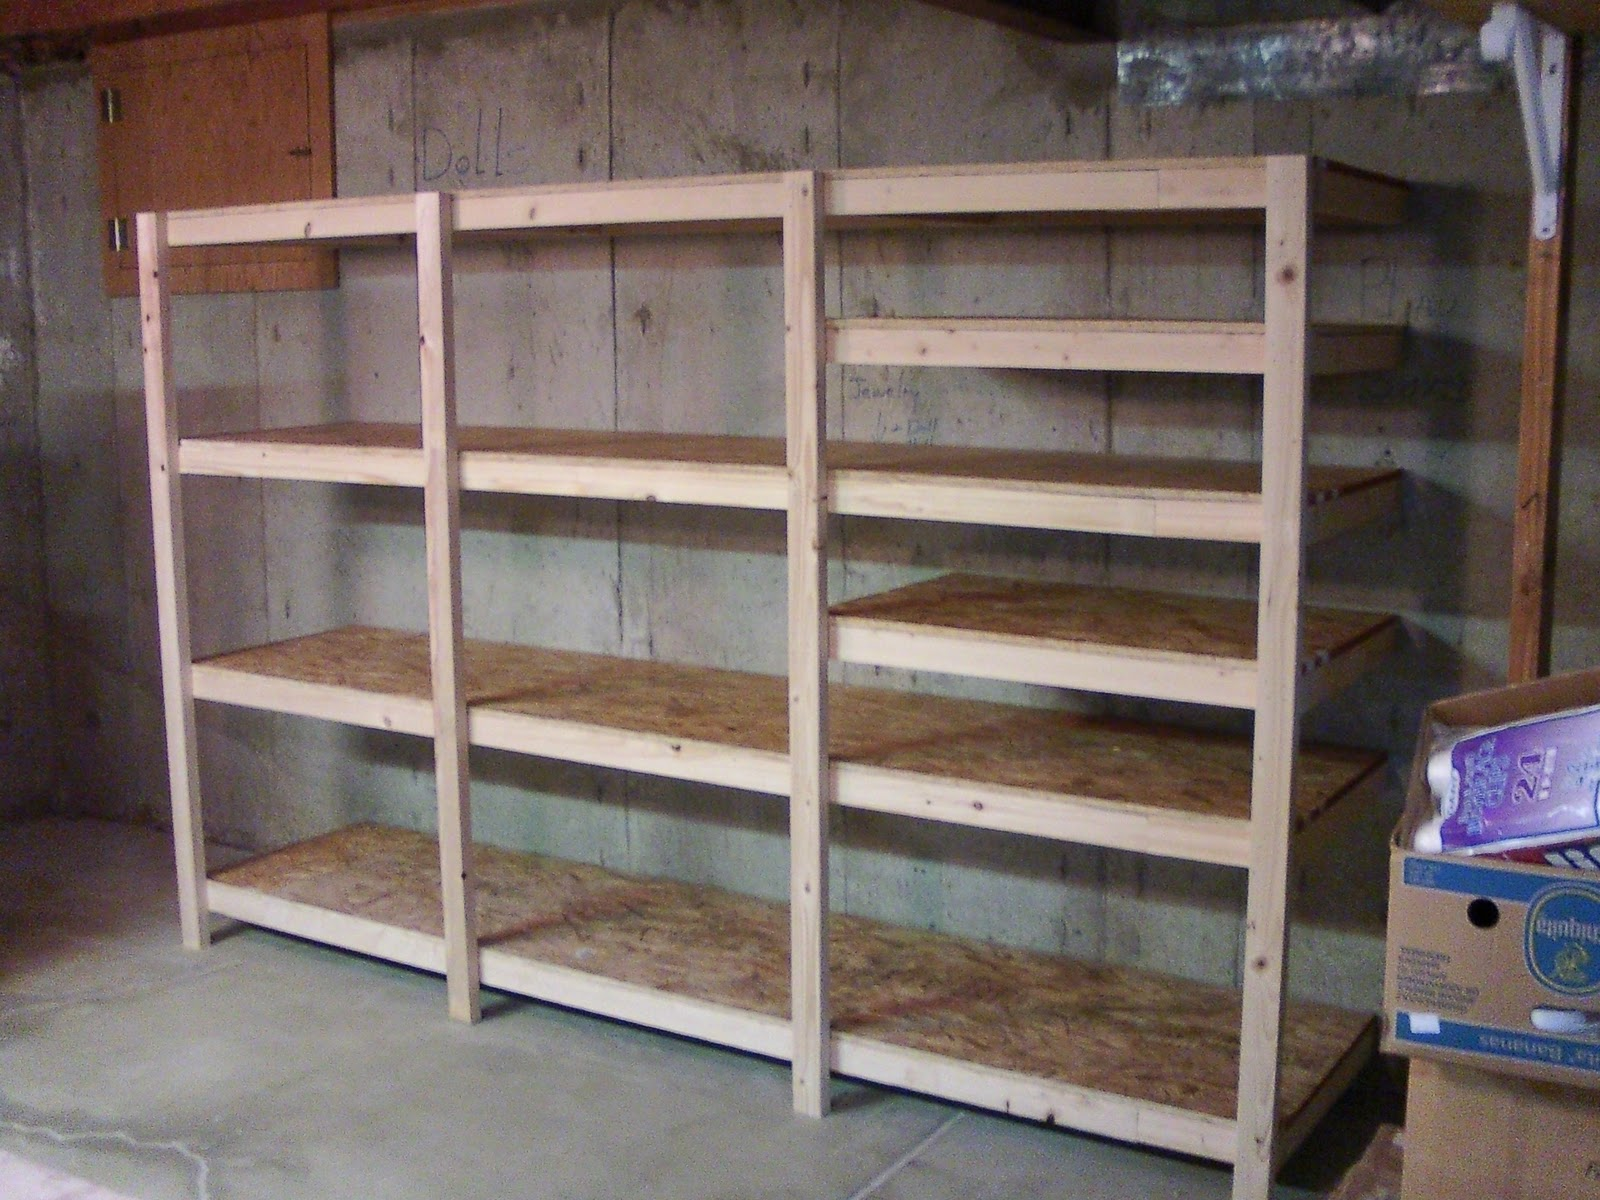 Building Basement Storage Shelves,Tenon Jig Plans,King Size Platform Bed  Frame Plans,How To Build A Wood Stove Fan   Videos Download